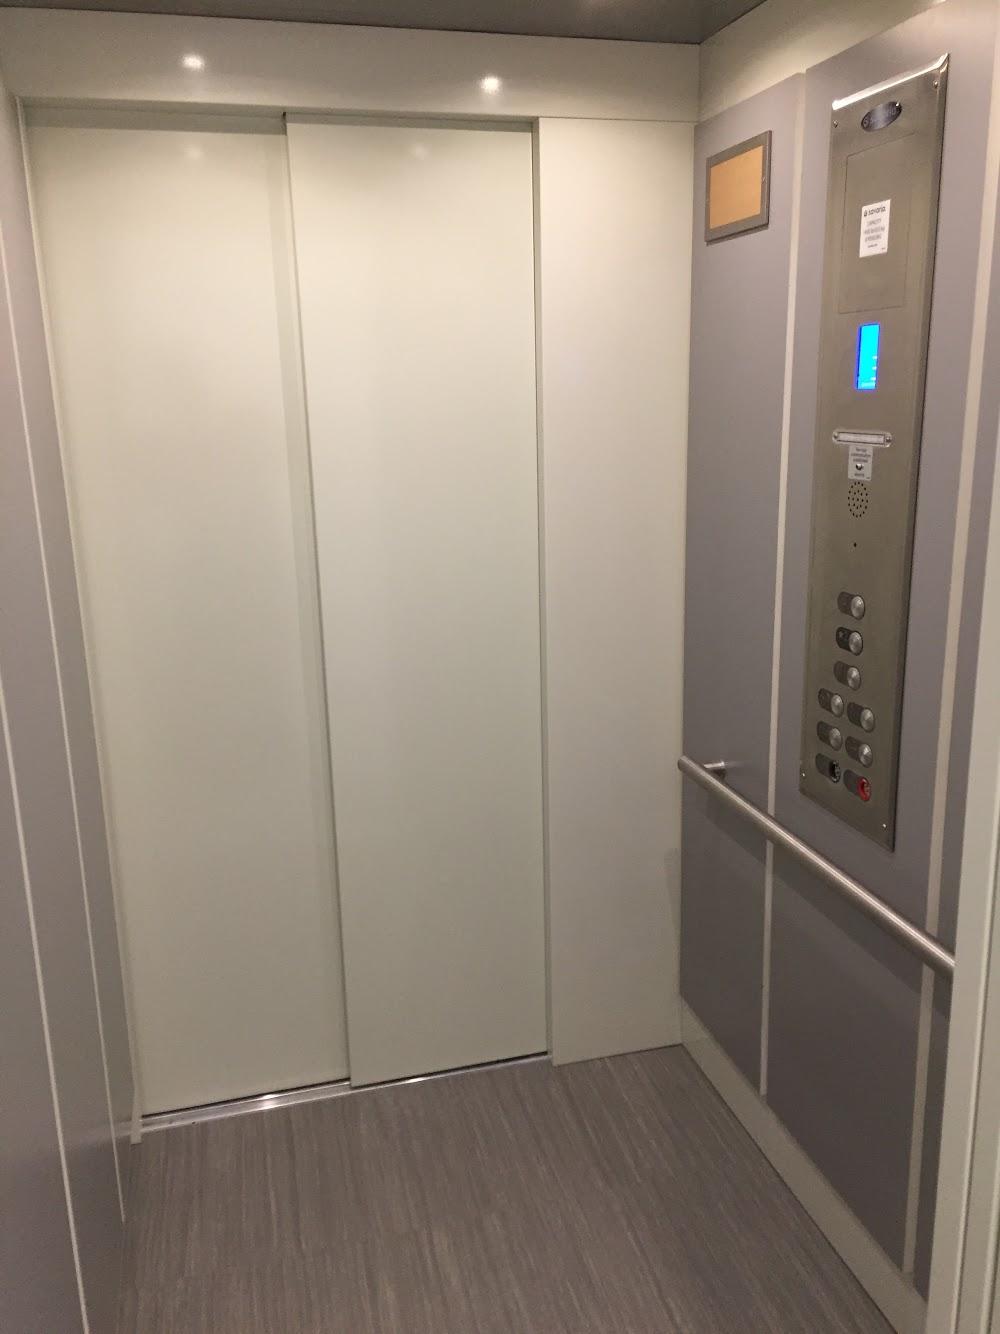 LULA Elevator Interior